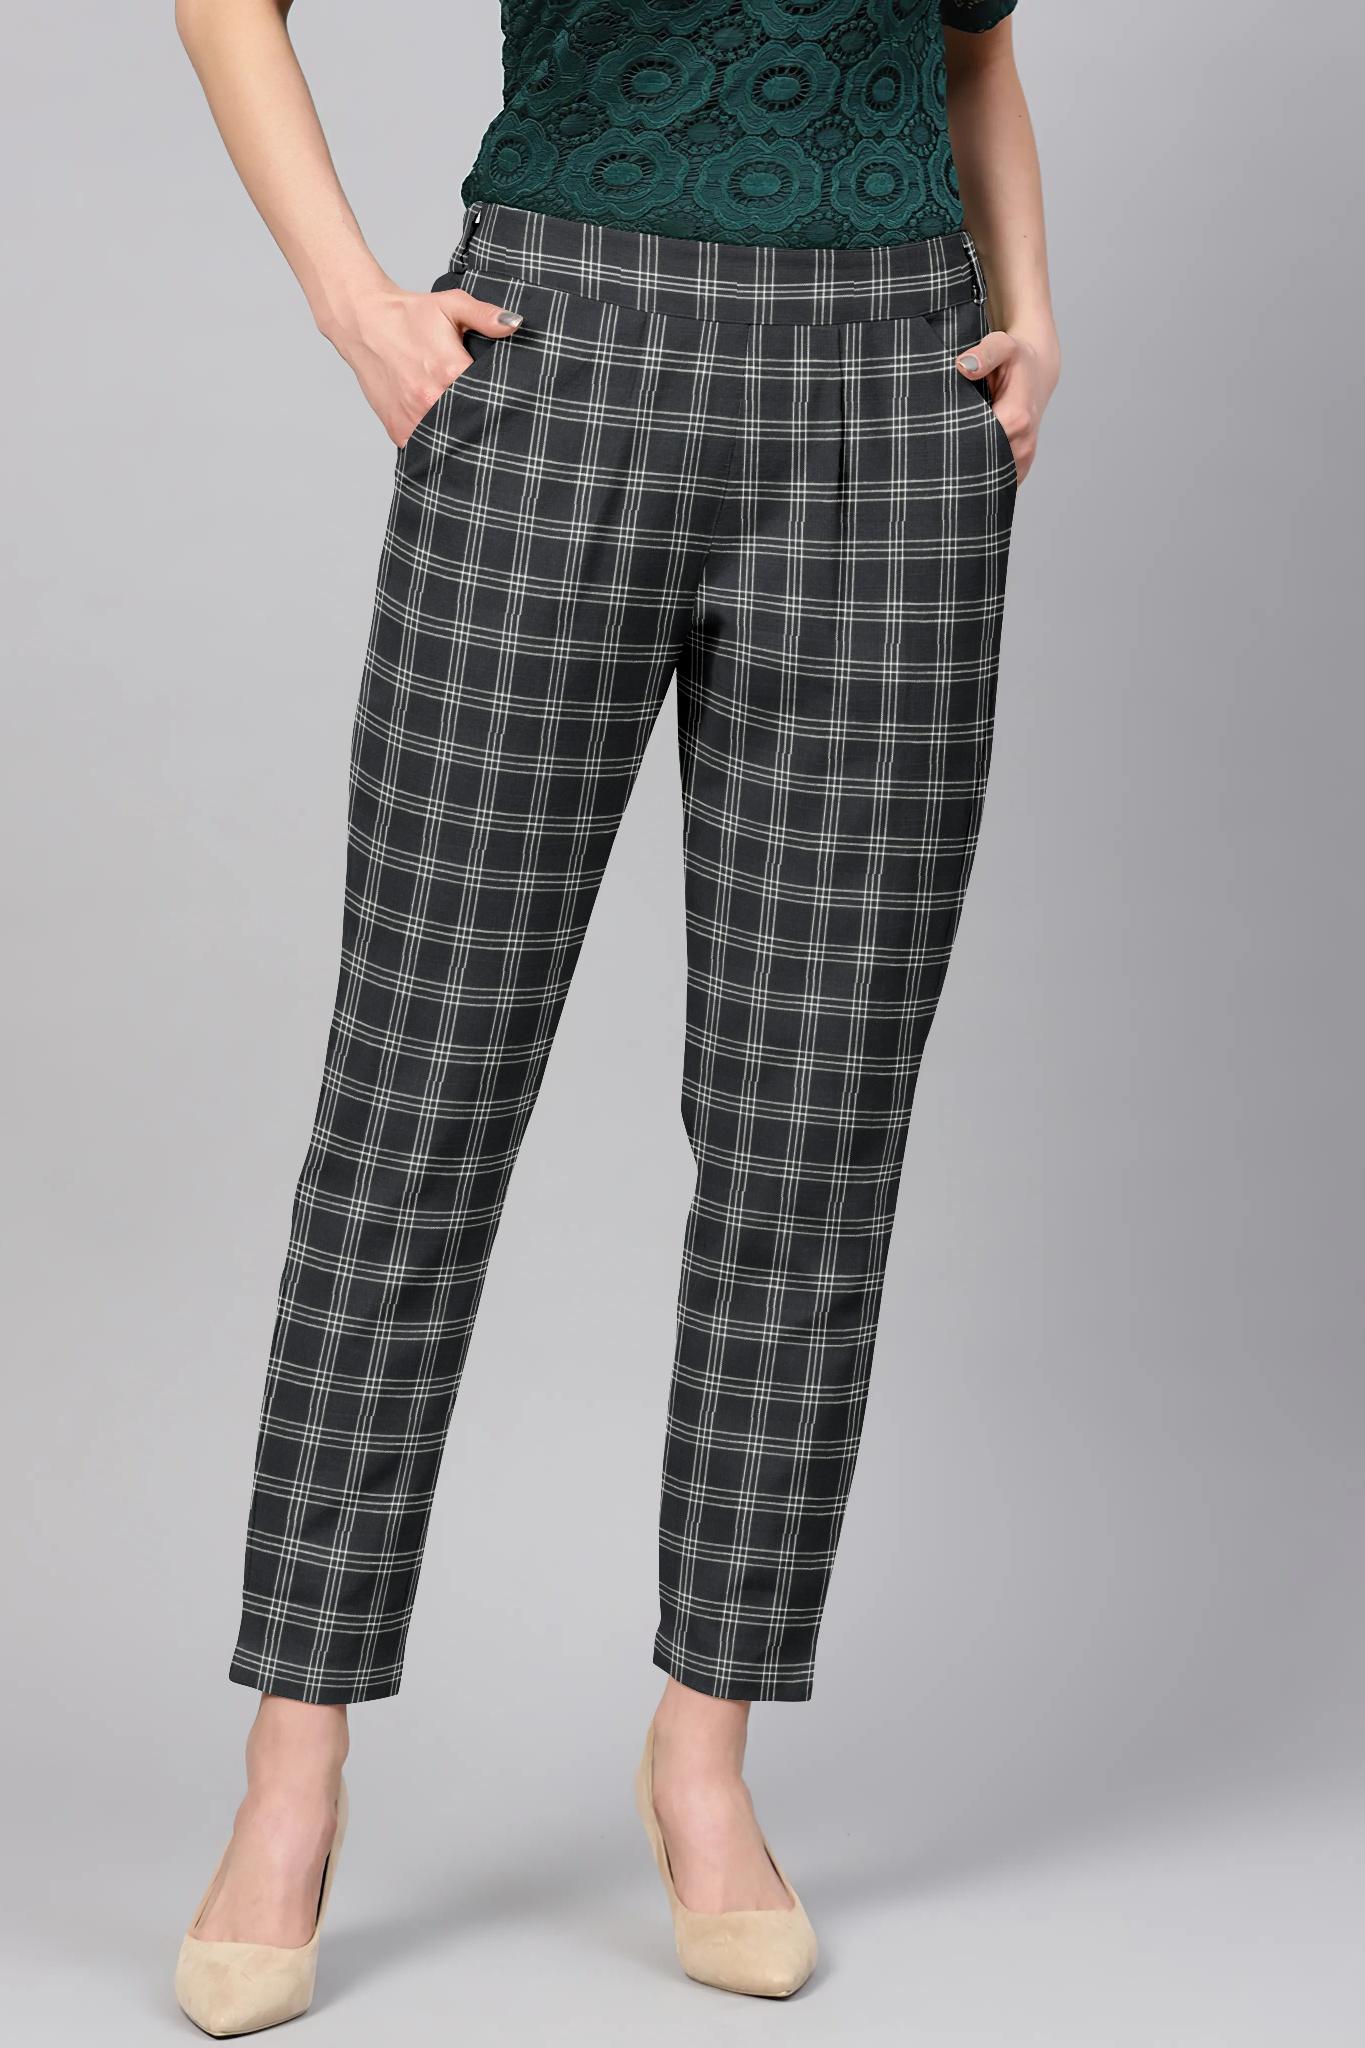 /home/customer/www/fabartcraft.com/public_html/uploadshttps://www.shopolics.com/uploads/images/medium/Black-White-Cotton-Check-Regular-Fit-Solid-Trouser-36083.jpg